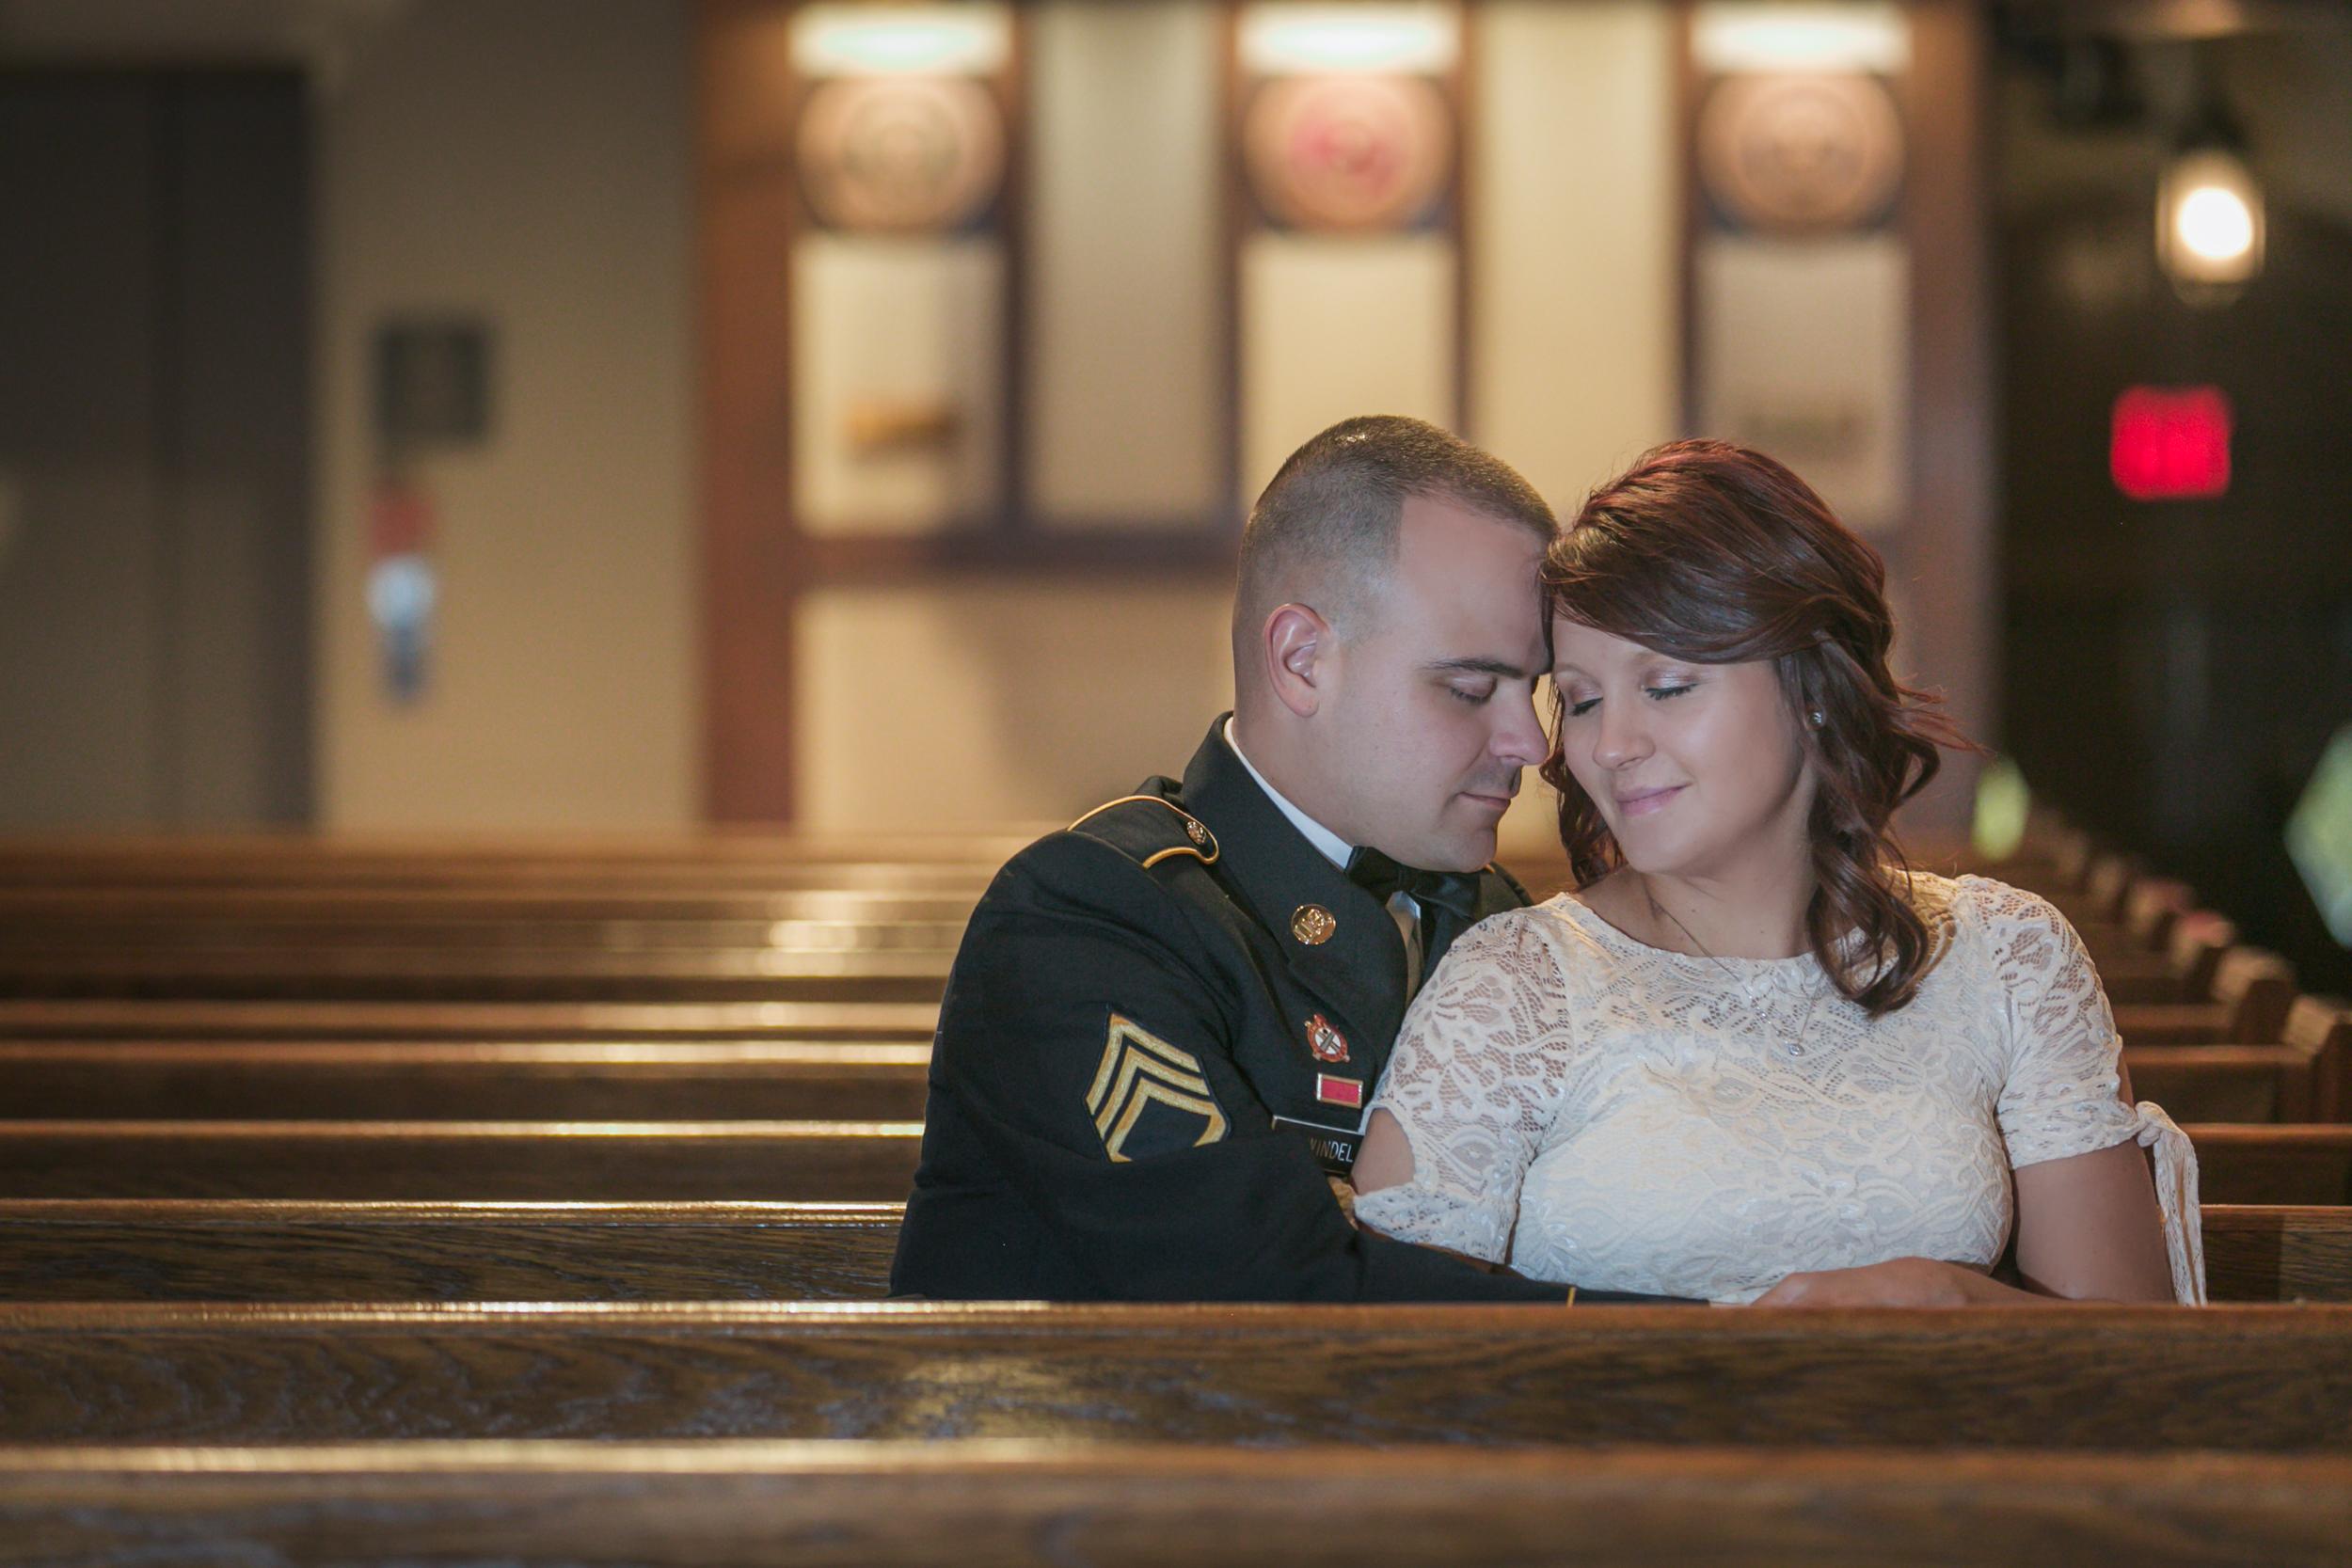 Fort Snelling Elopement St. Paul, MN, Fort Snelling Elopement, Military Elopement, Intimate Military Wedding, intimate elopement wedding-www.rachelsmak.com37.jpg